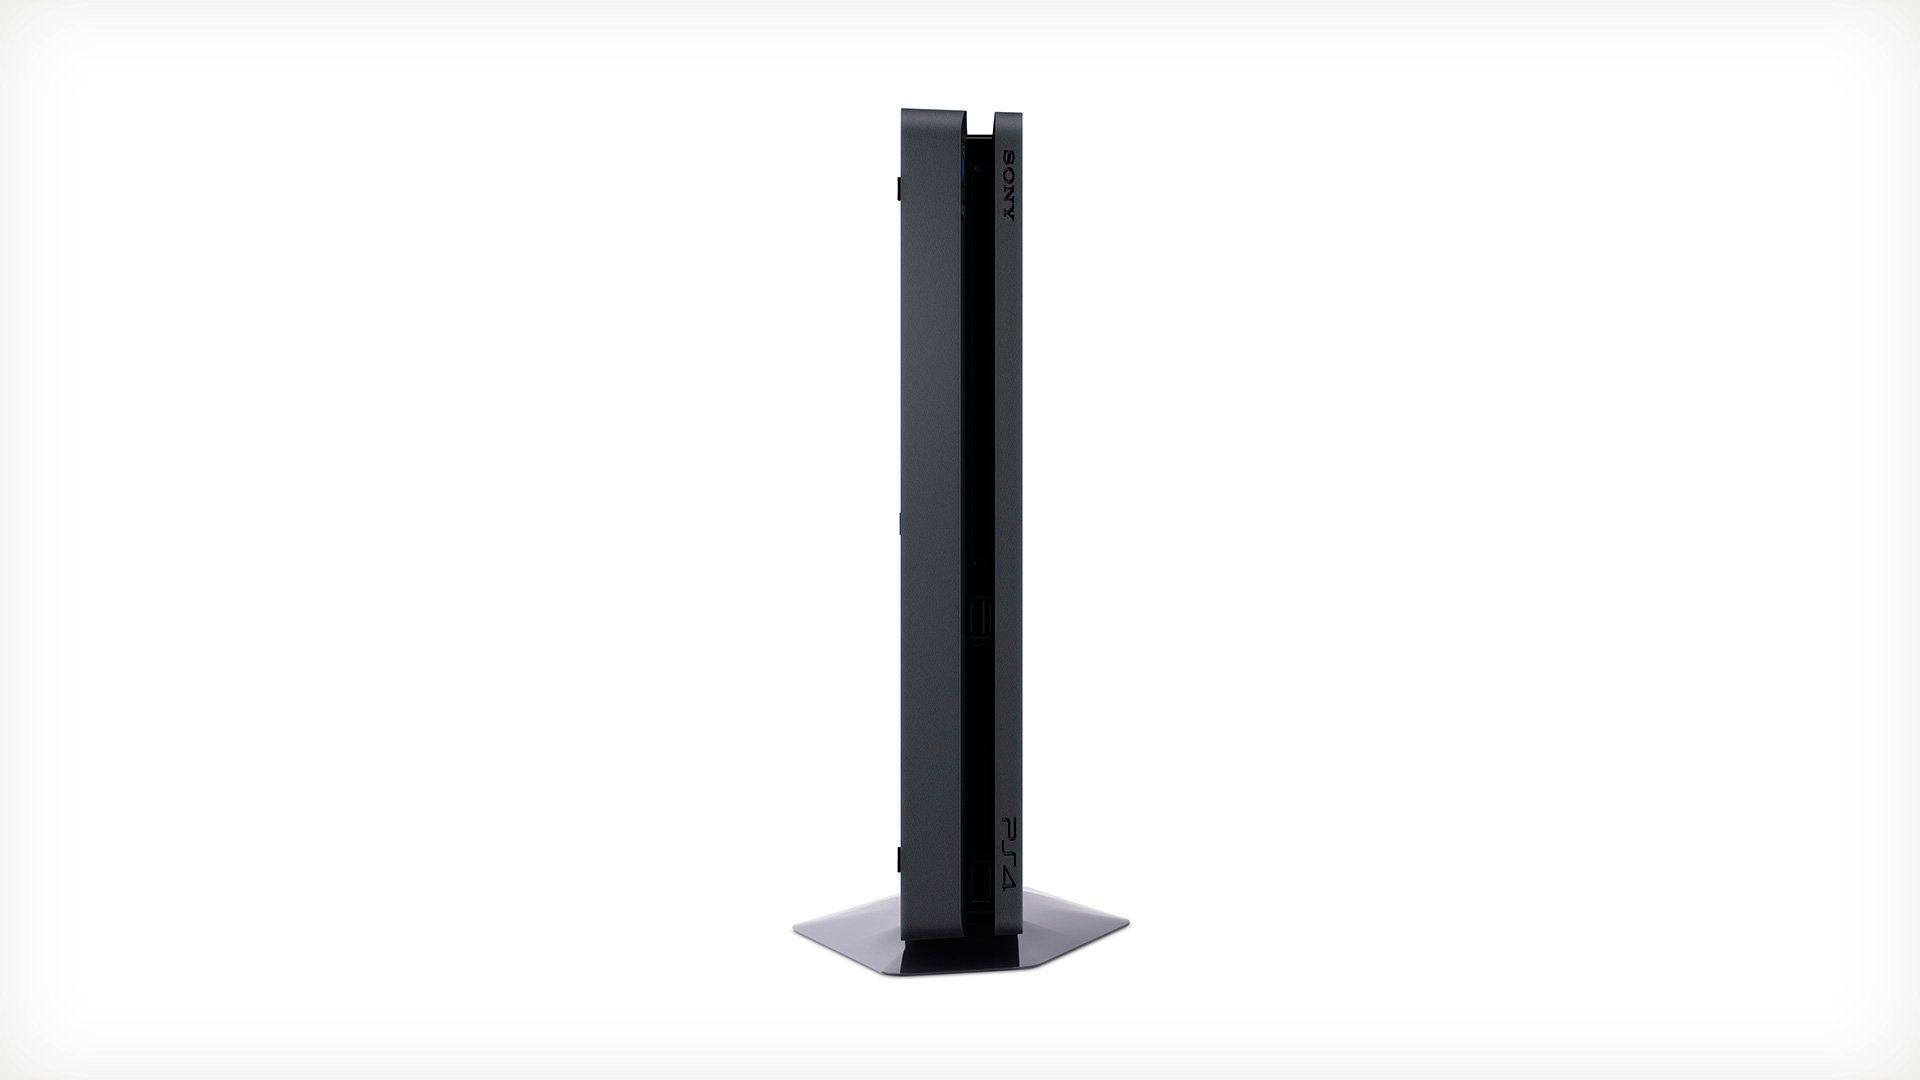 PlayStation 4 Slim 1Tb 2 джойстика изображение 5